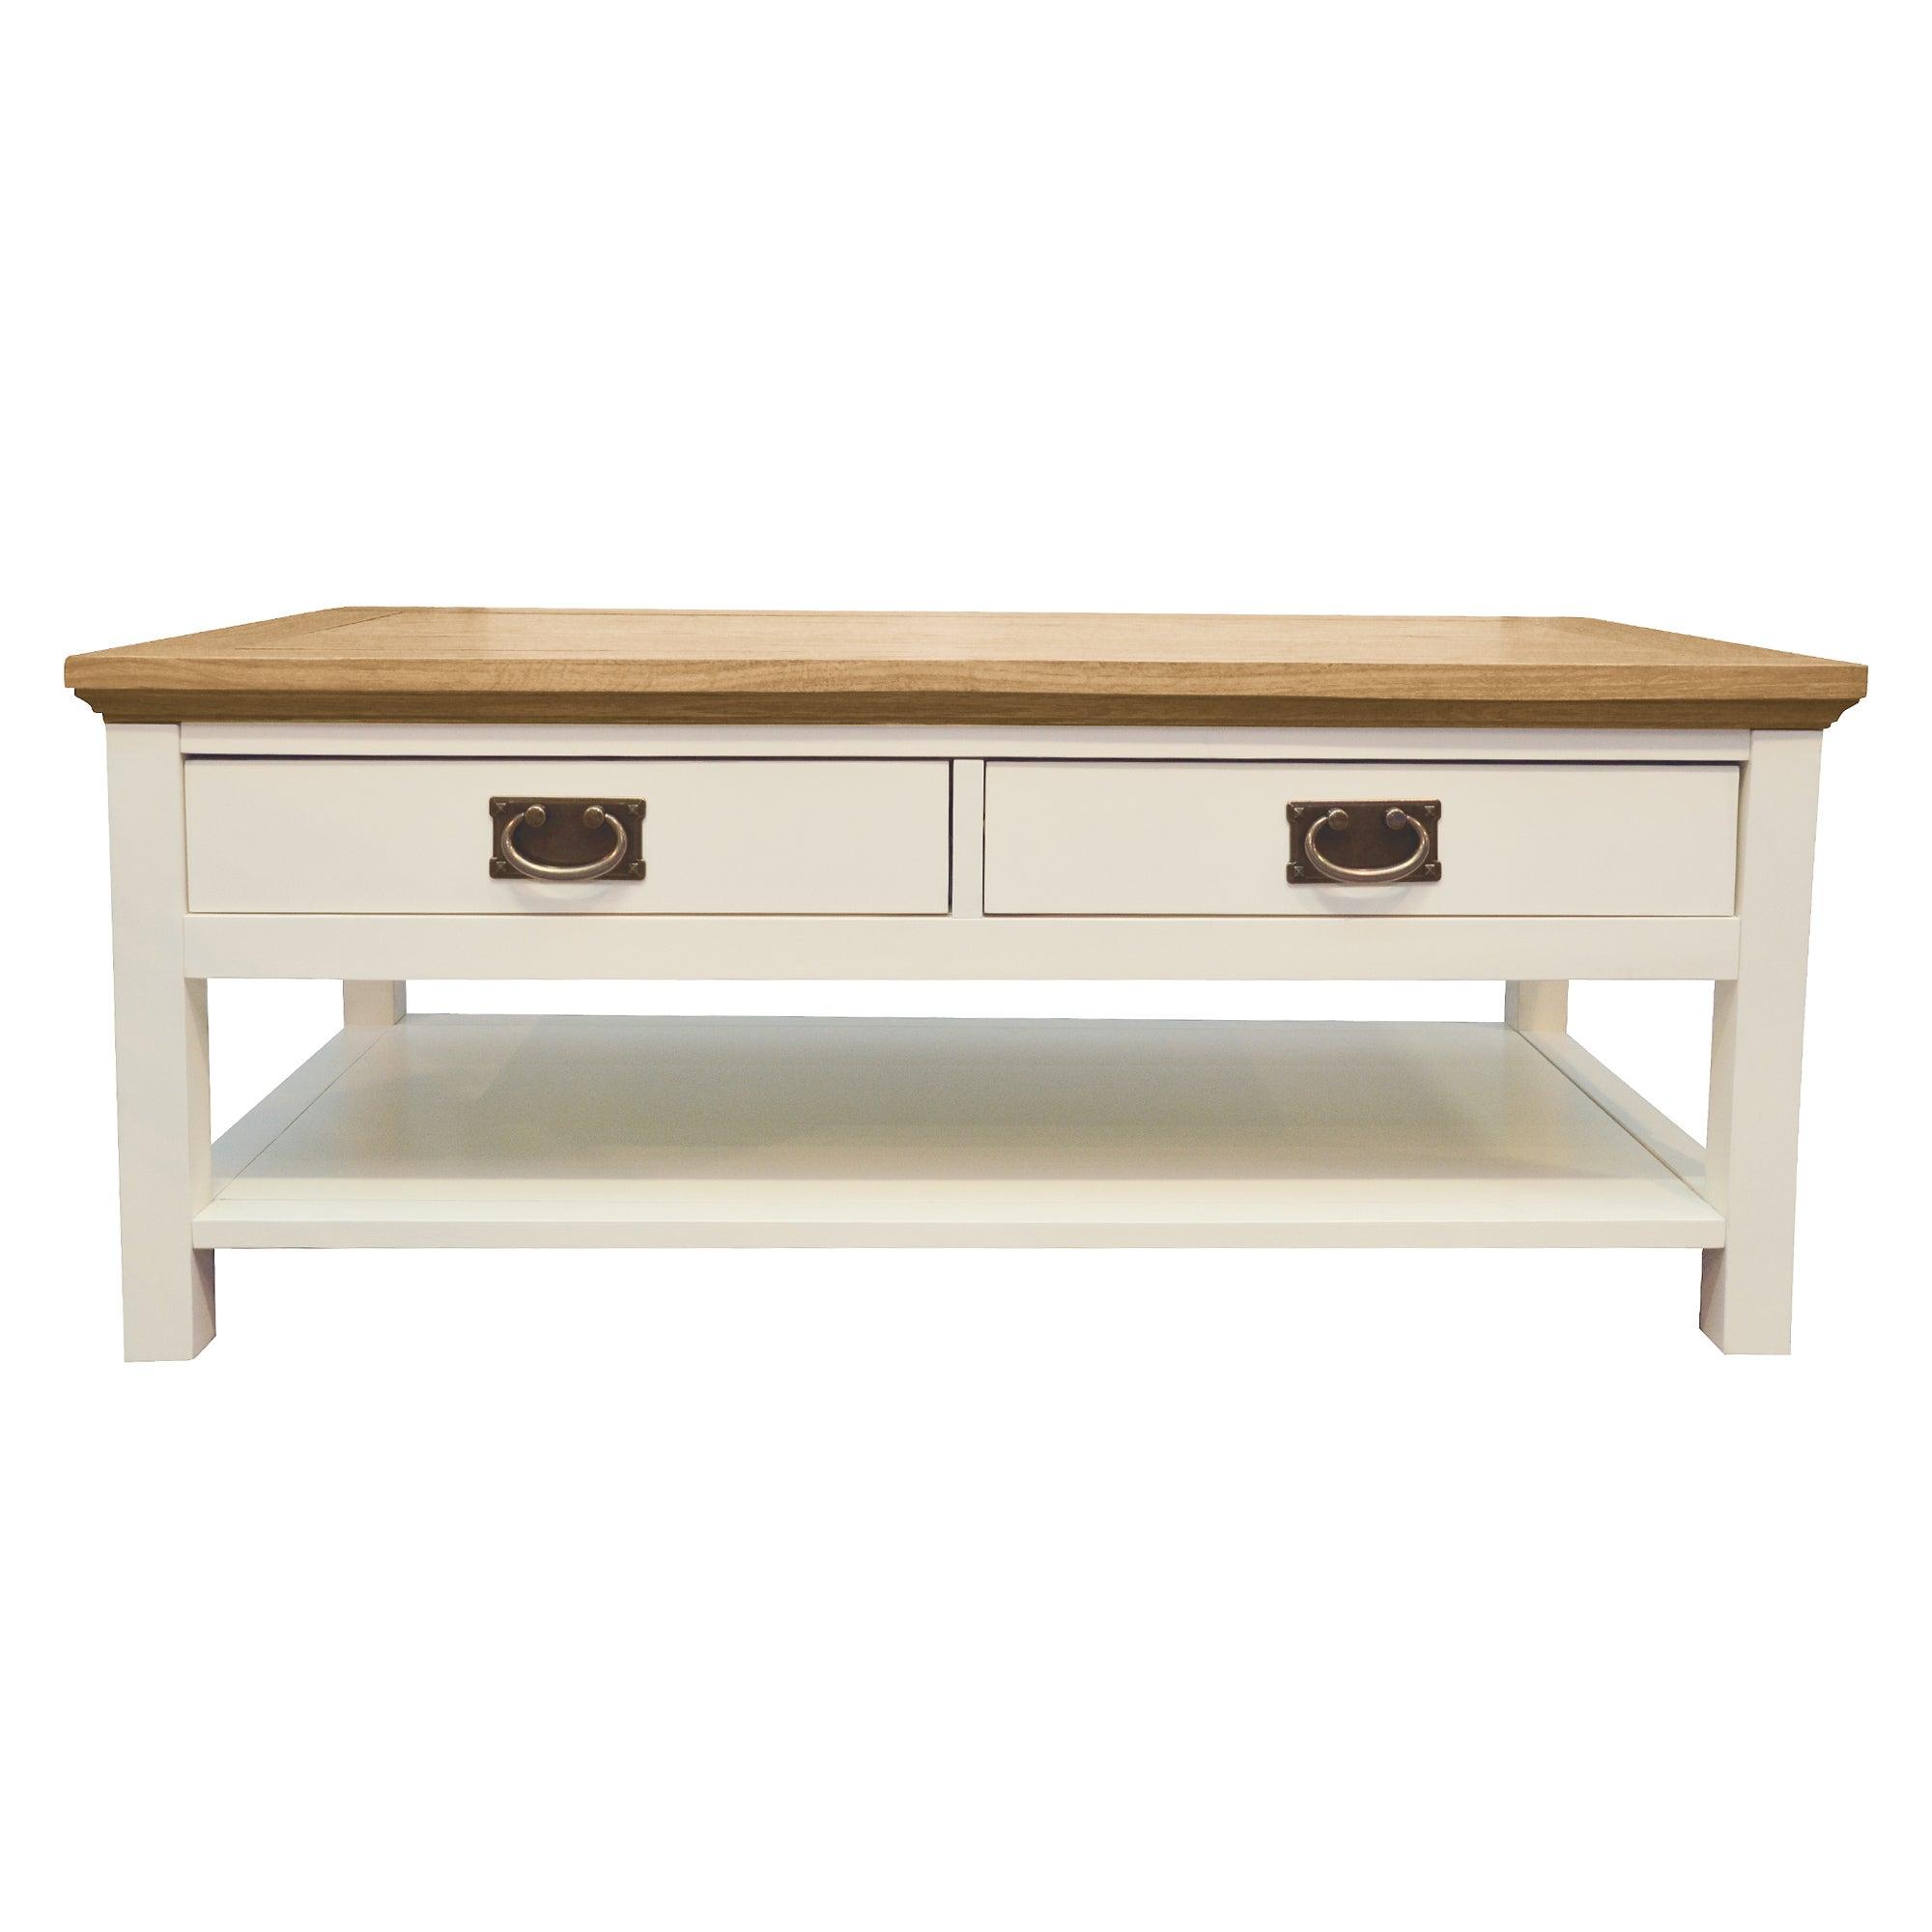 Penzance Oak Two Tone Coffee Table